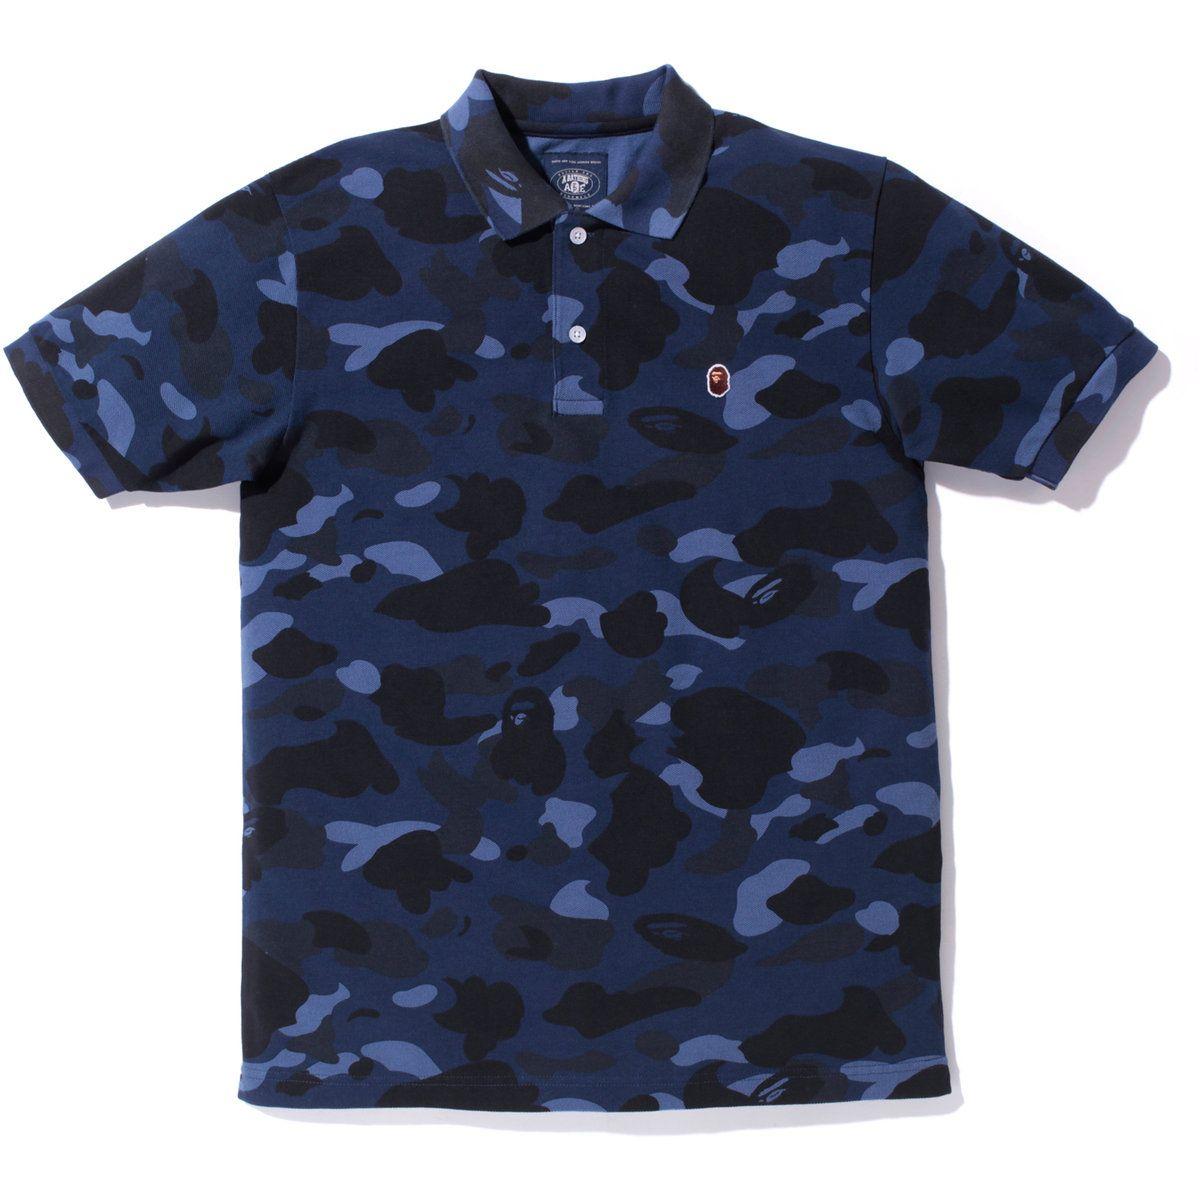 d3b7cb7b Bape, Camo Polo | Clothes and Kicks | Bape, Mens fashion, Camo shirts